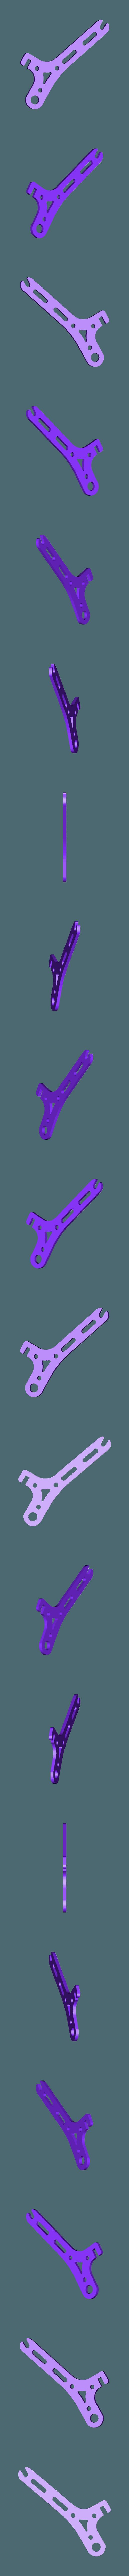 Spool_Holder.stl Download free STL file Strong 4 Spool Holder • 3D printer object, dancingchicken